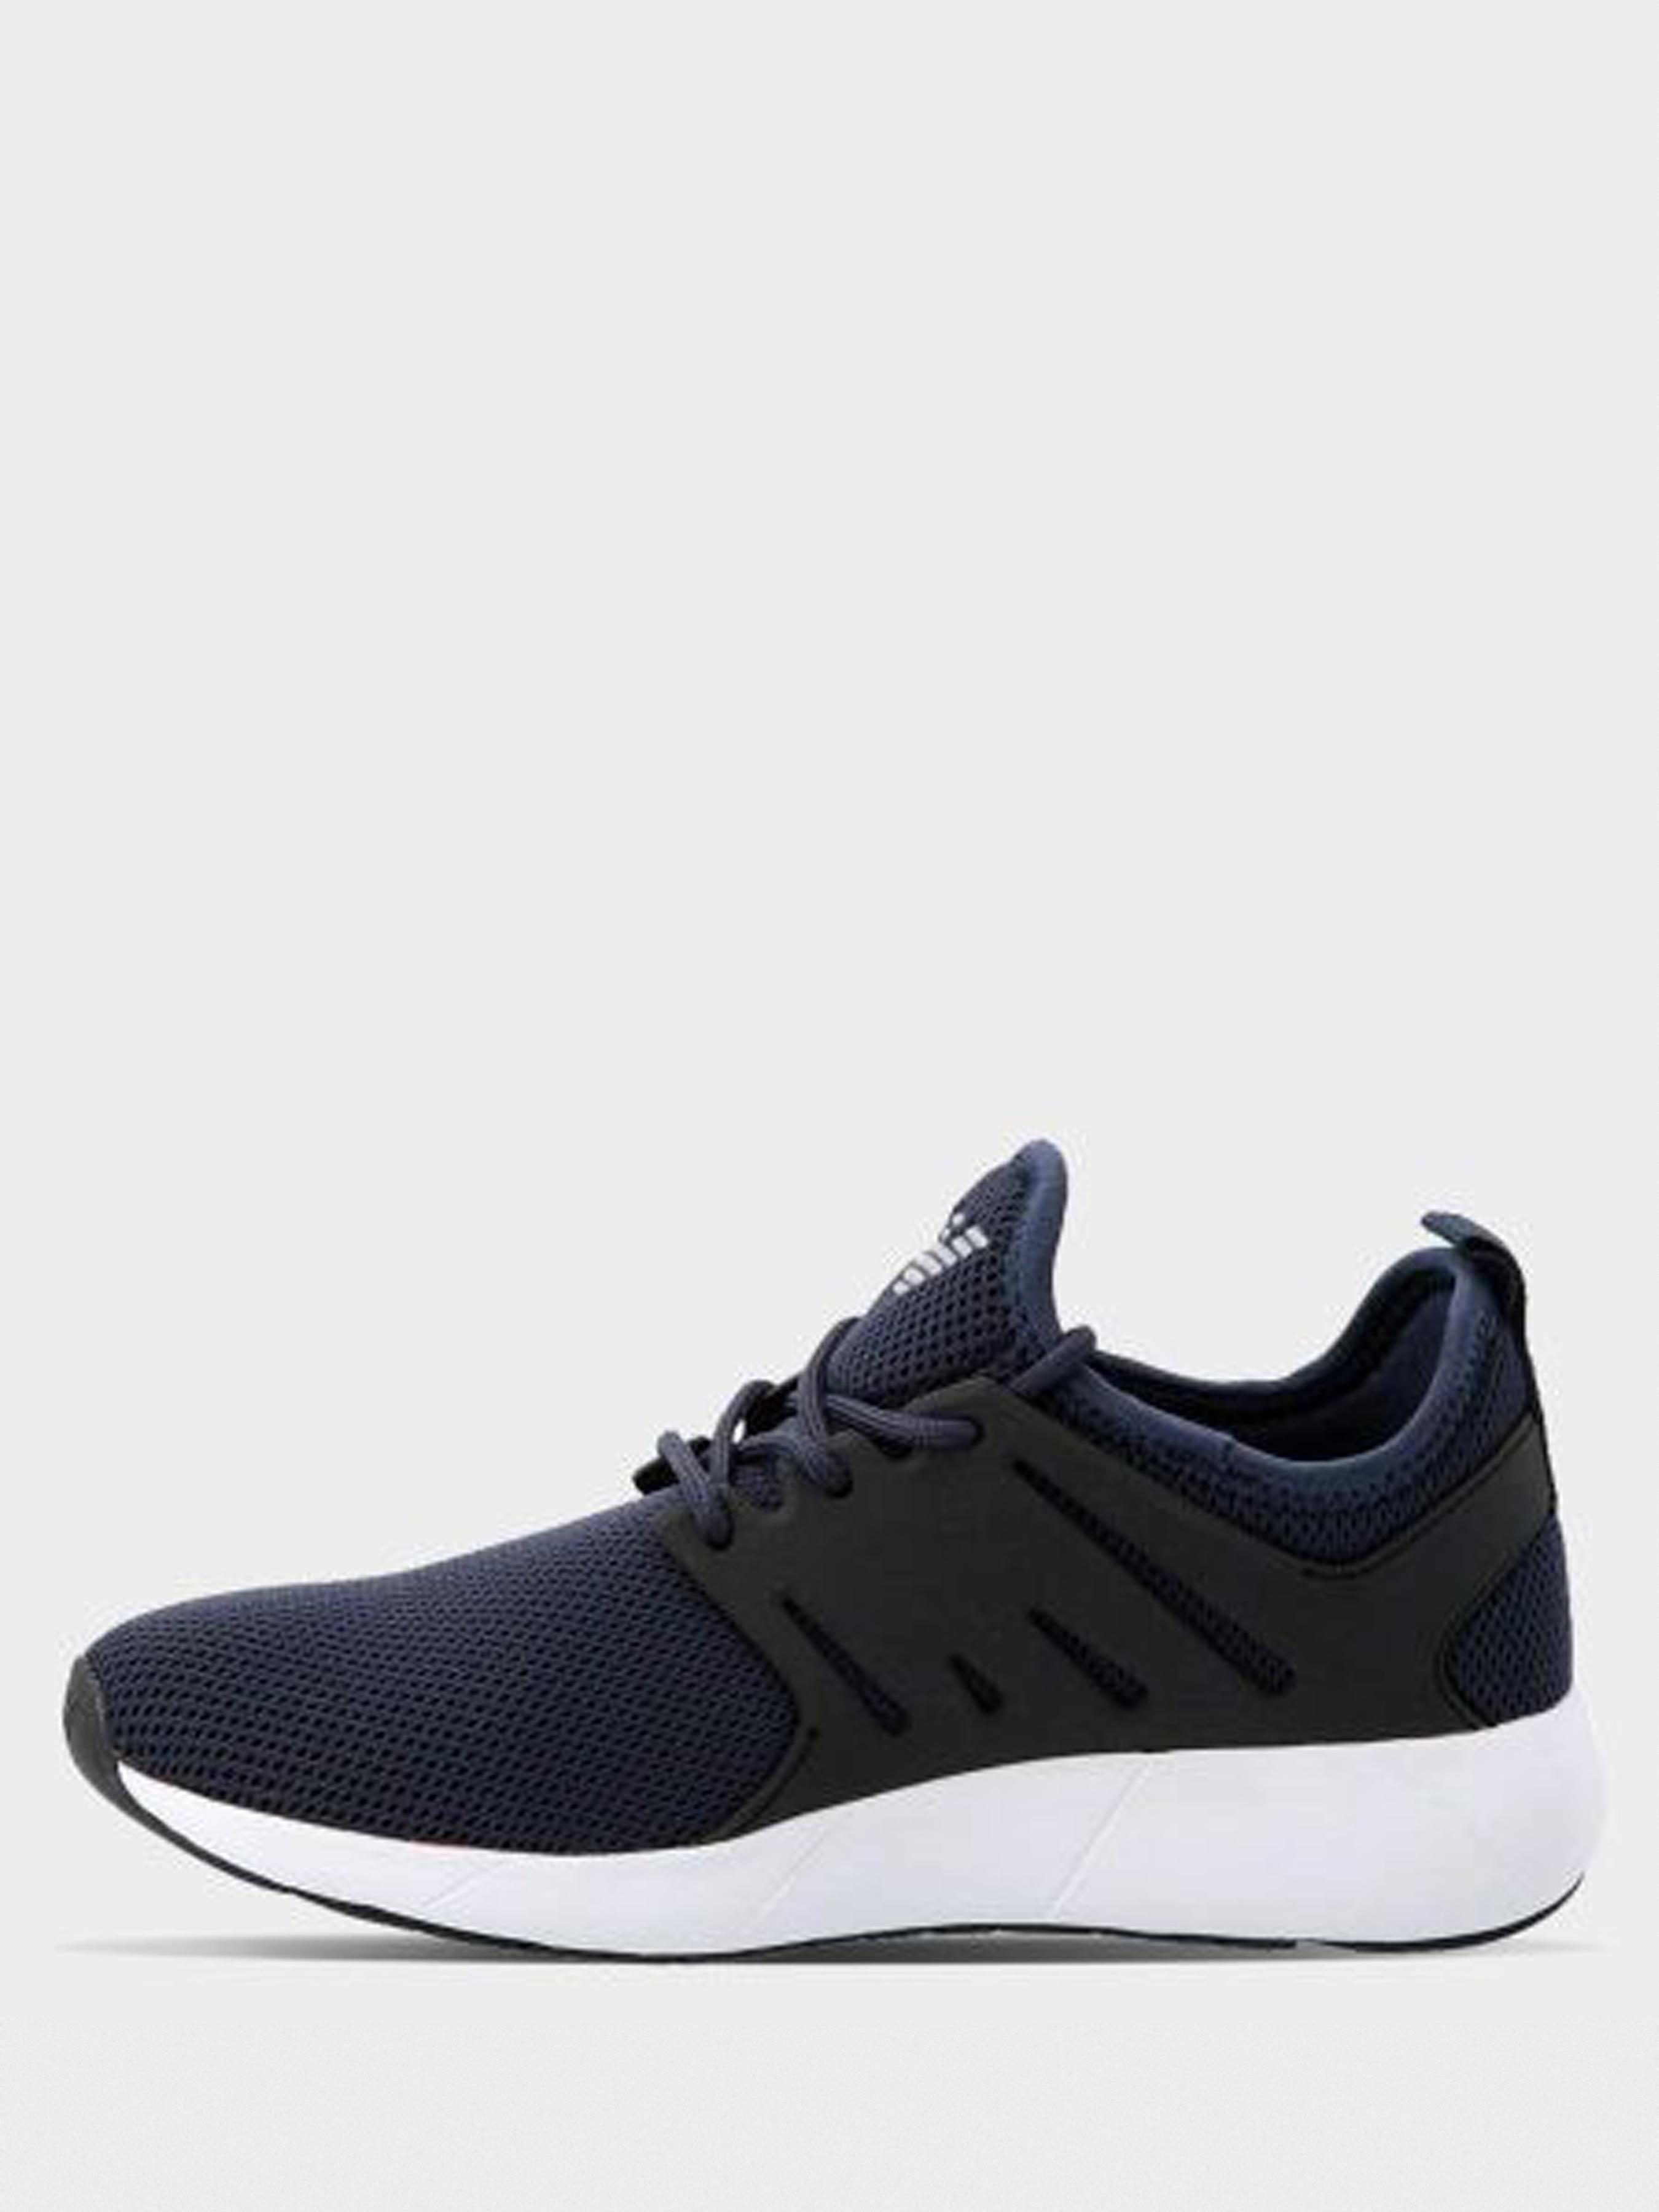 Кроссовки женские EA7 7S10 цена обуви, 2017